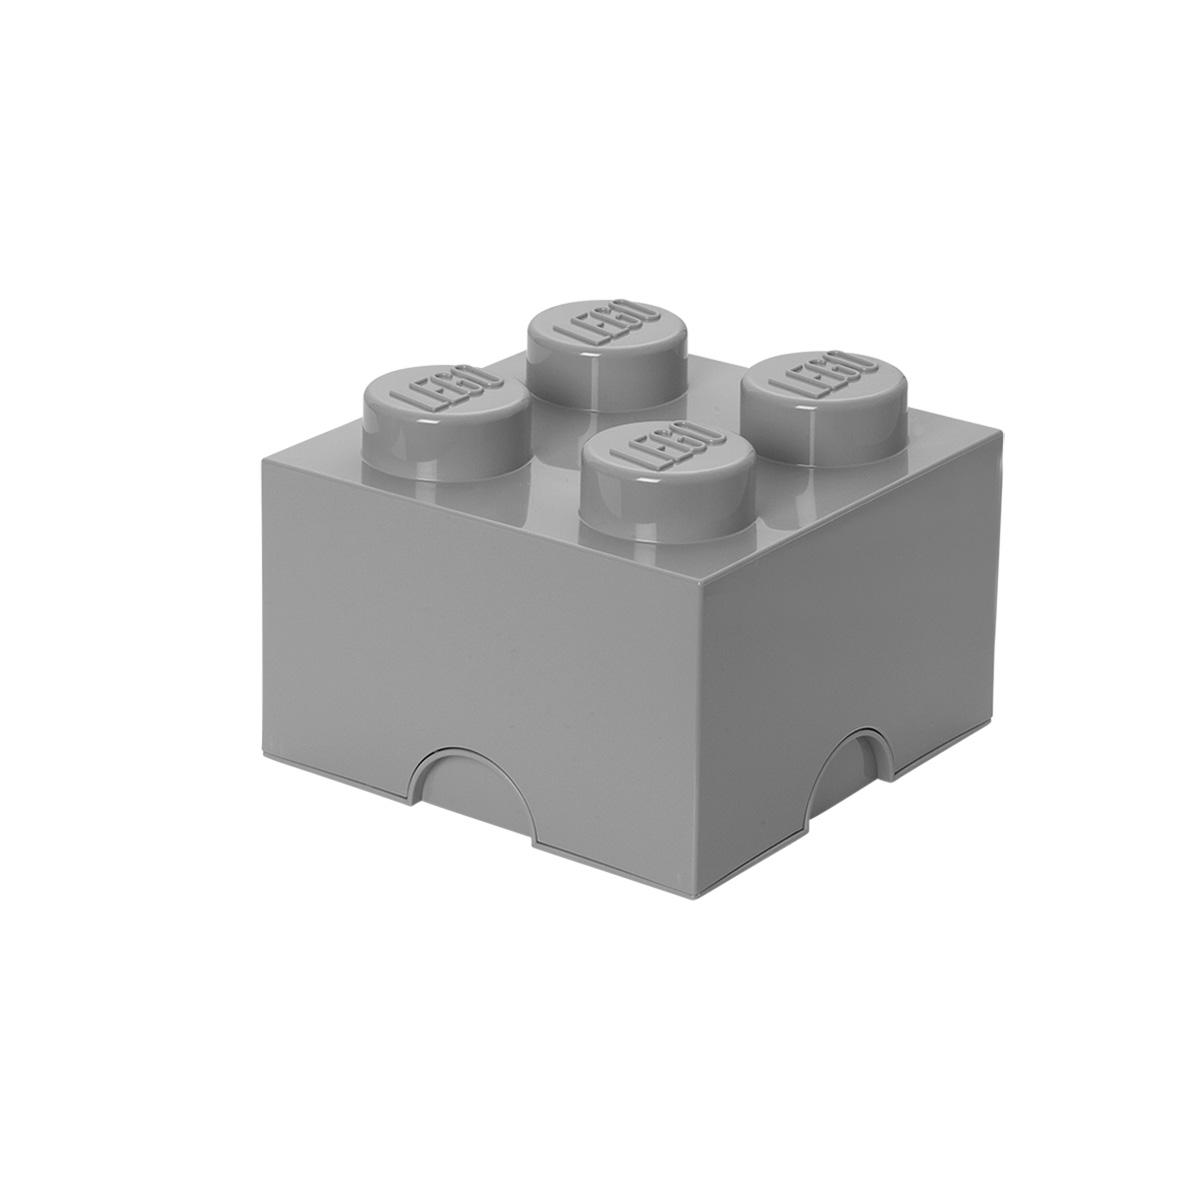 LEGO opbevaringskasse med 4 knopper - Grå